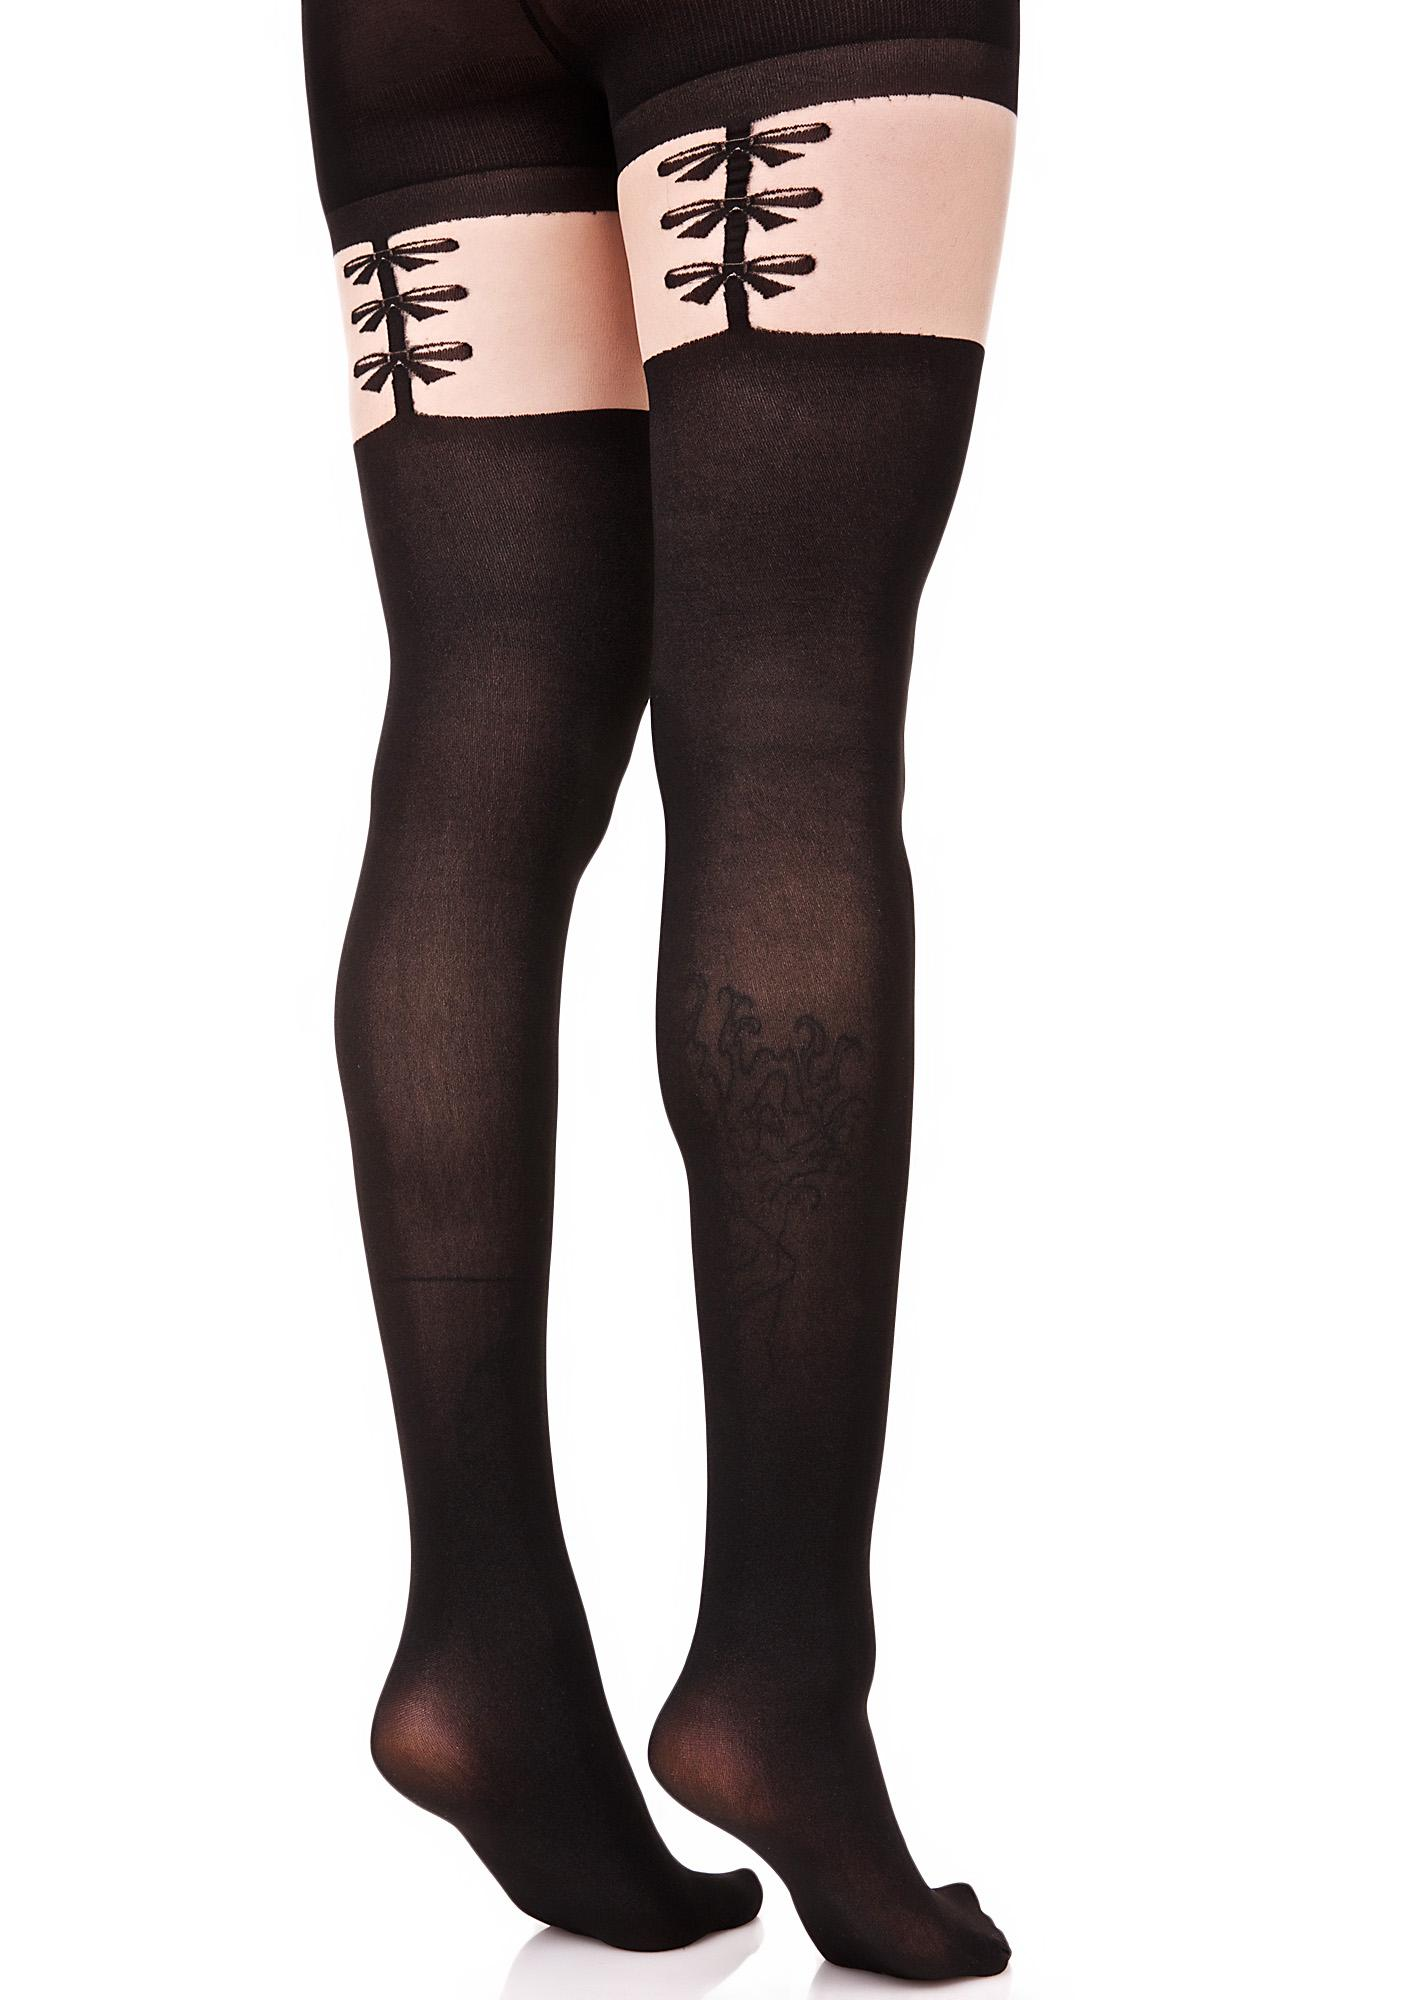 Sweet Treat Garter Stockings